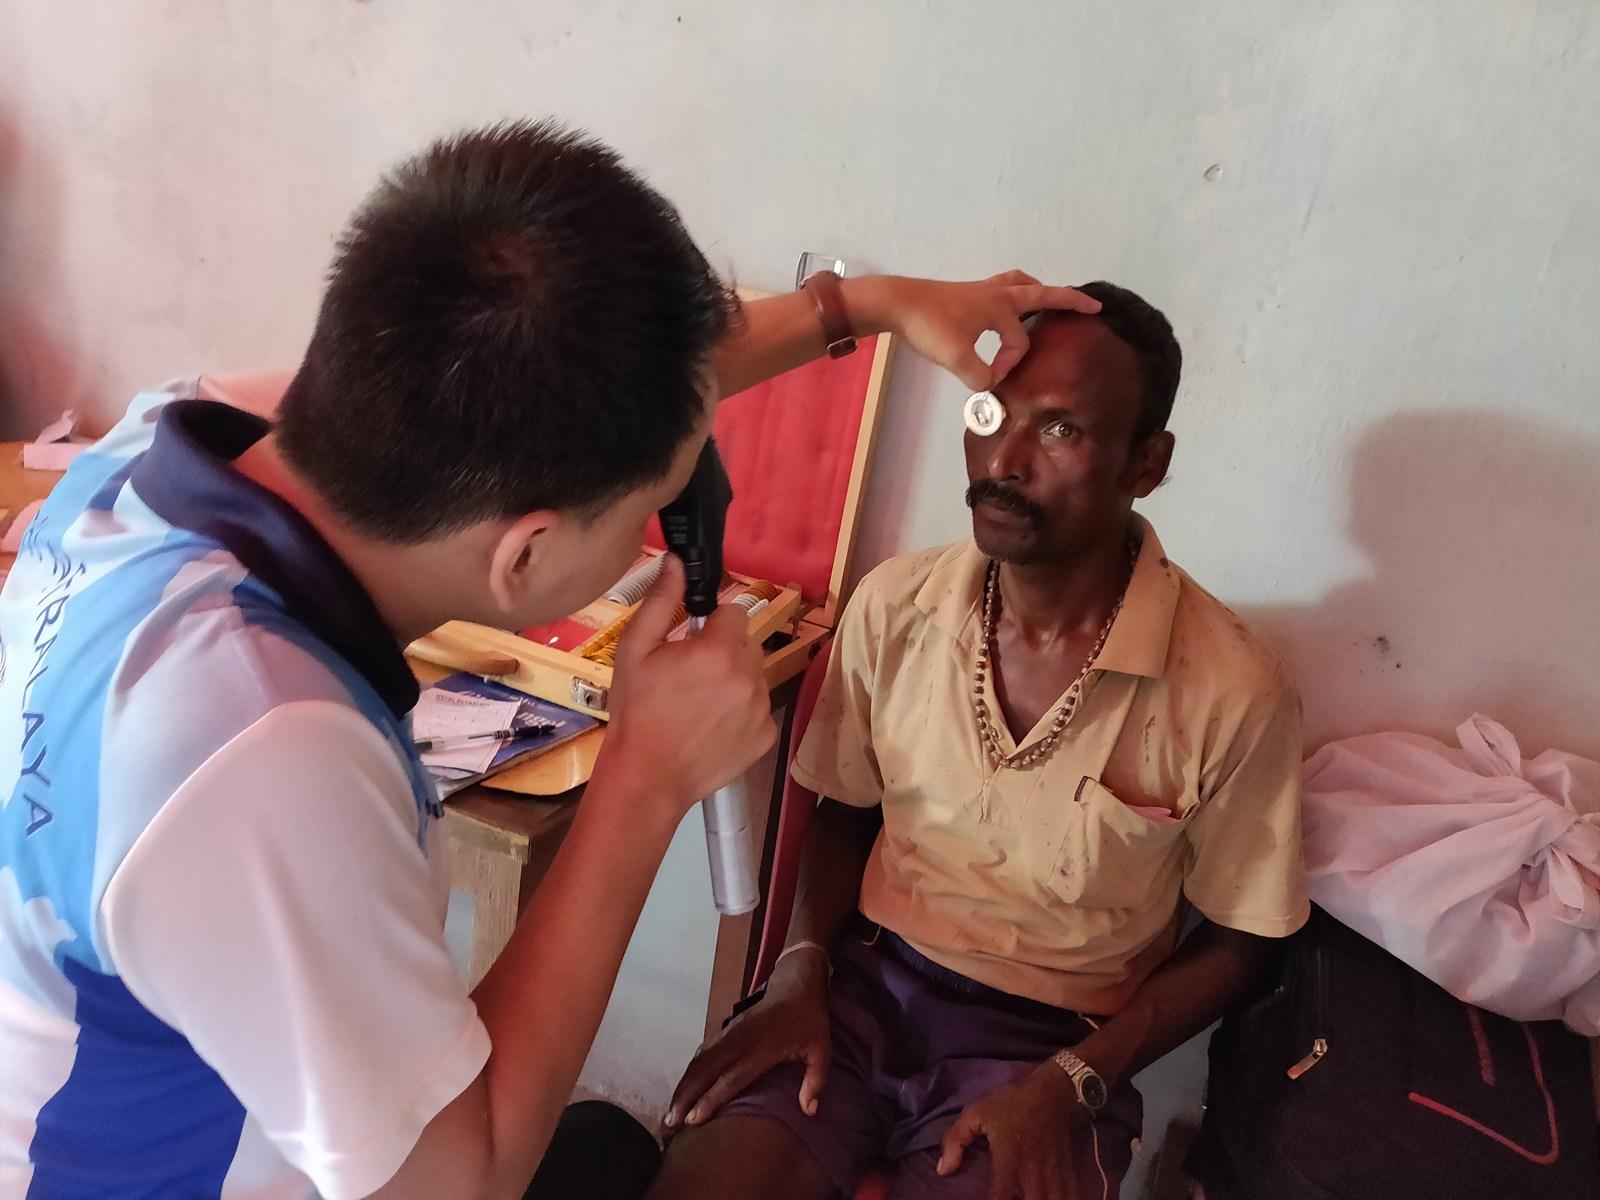 Free-Health-Camp-Eye-Screening-at-Gwala-Basti-Mechinagar-15-Jhapa-Nepal-Rotary-Club-of-Kakarvitta-35